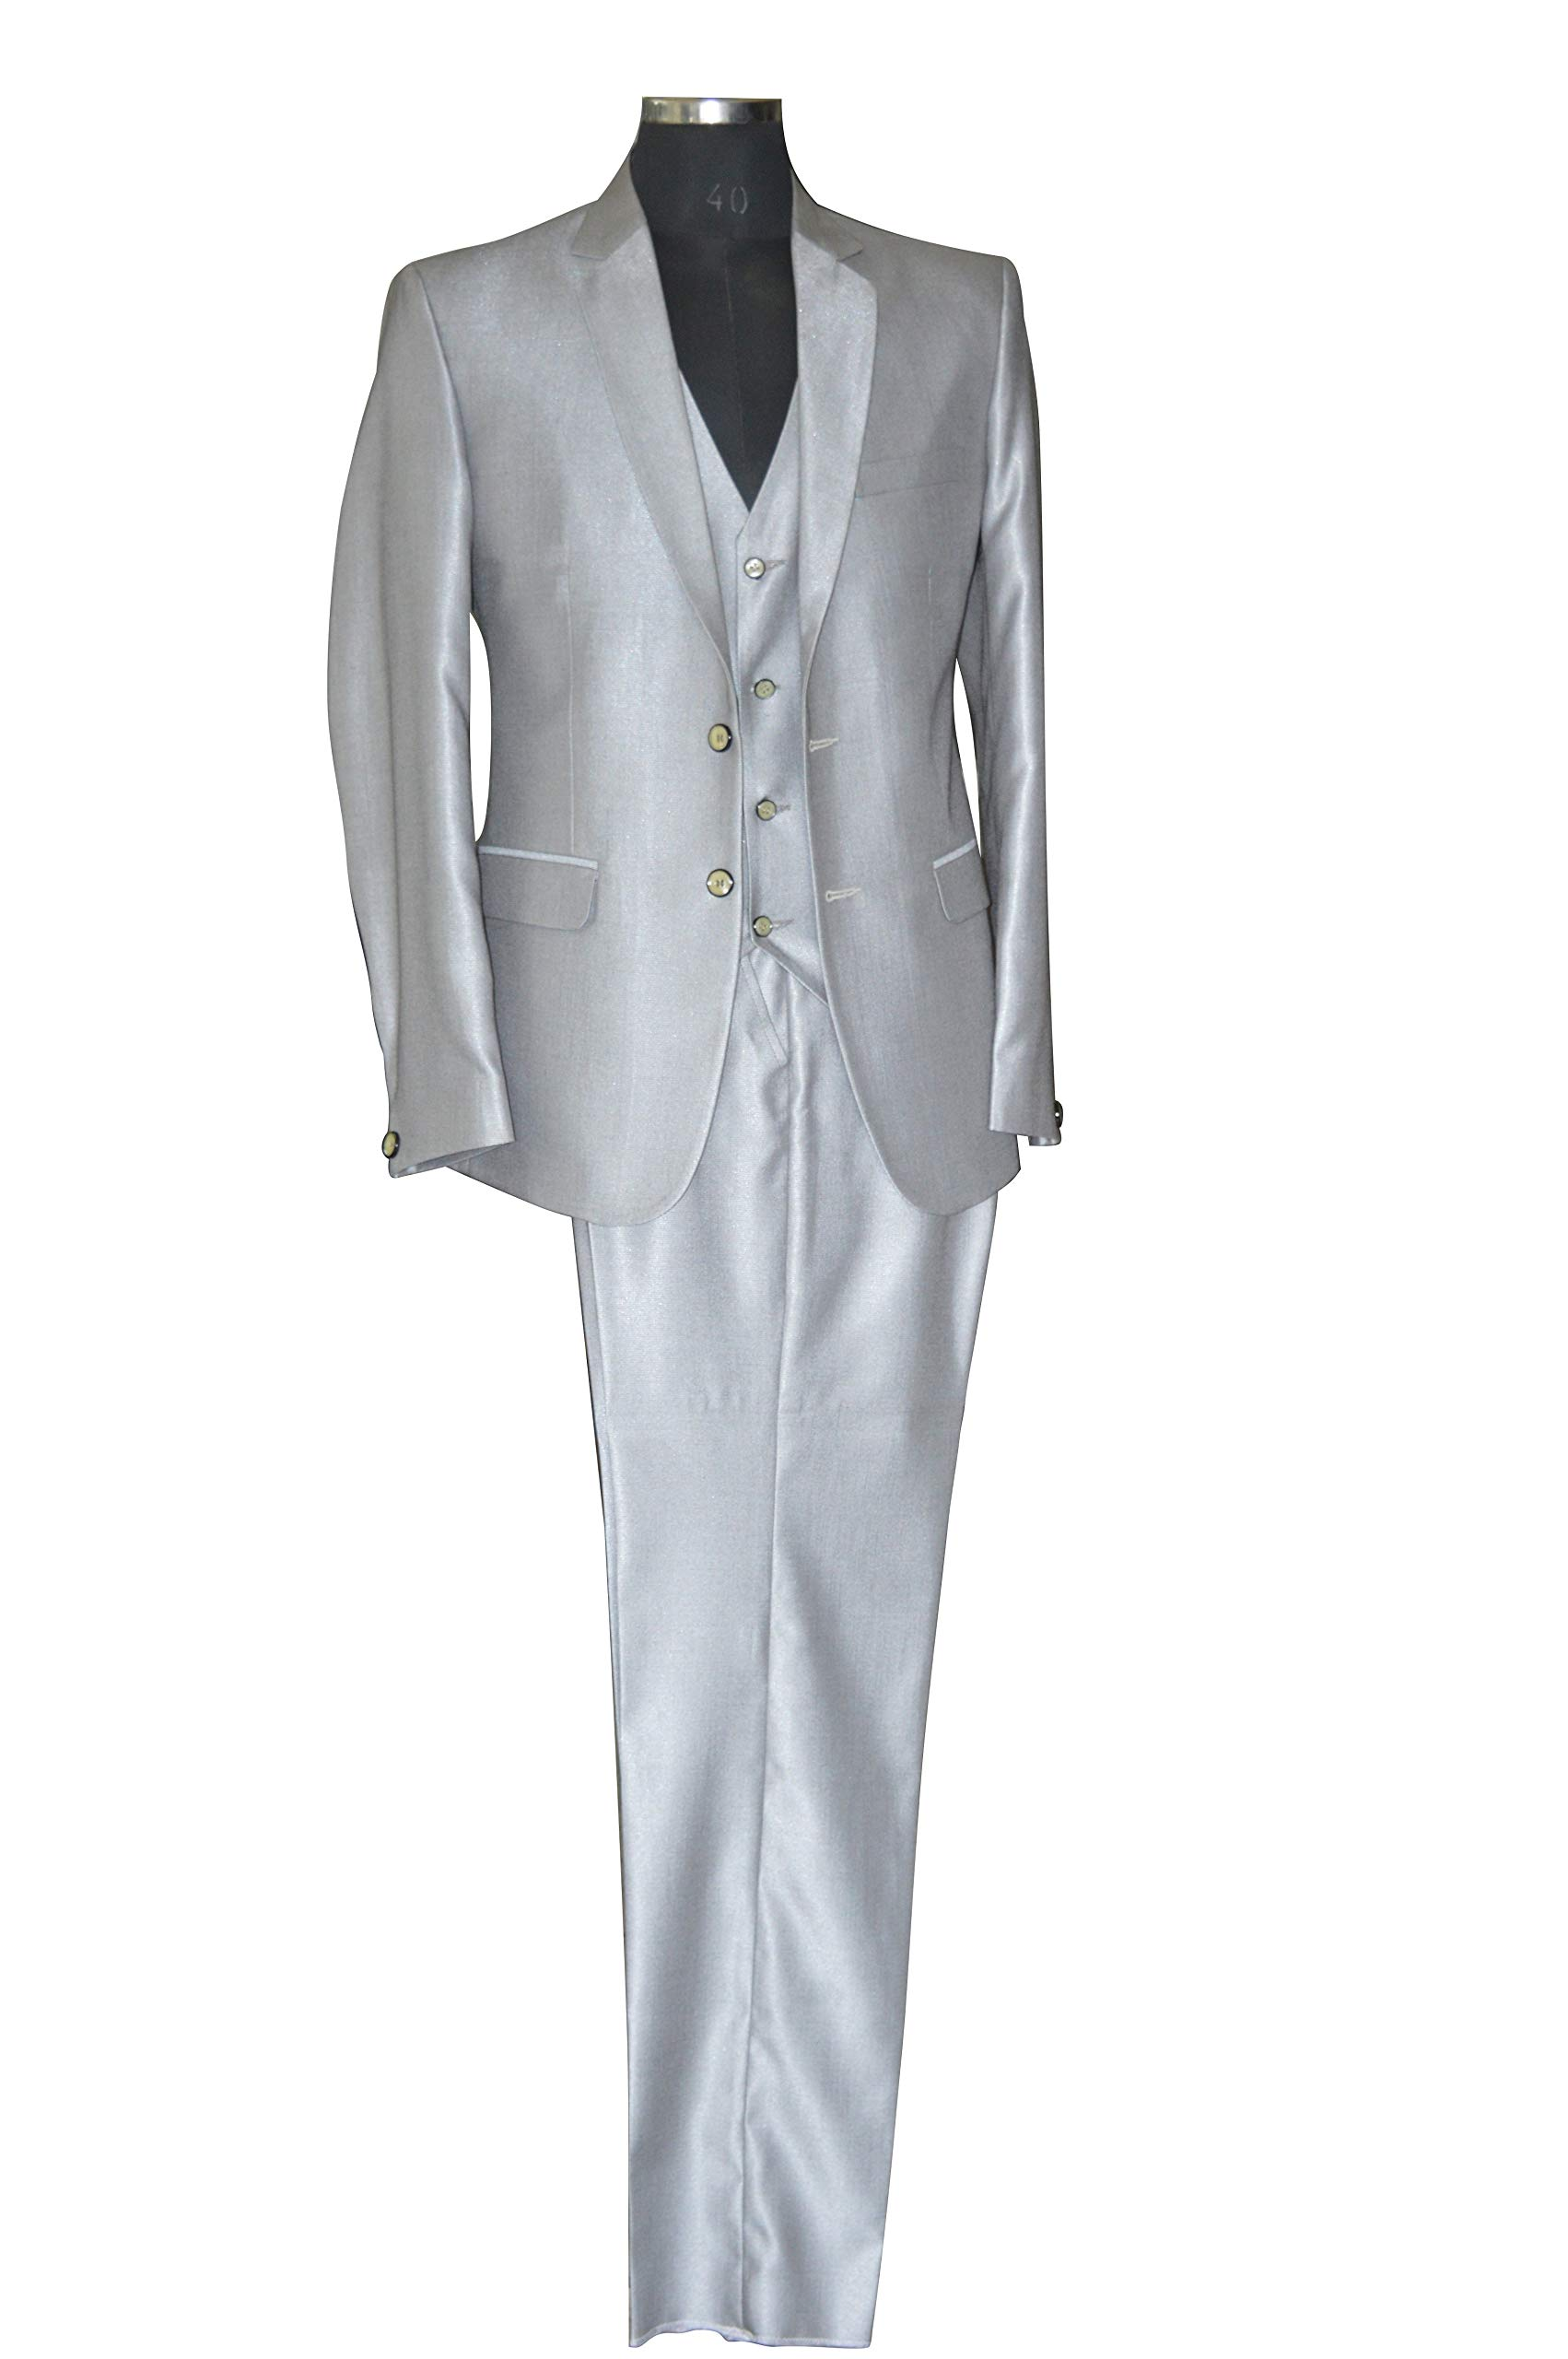 Mens Grey Formal Ideal Suit for Weddings 40'' Jacket 34'' Trouser